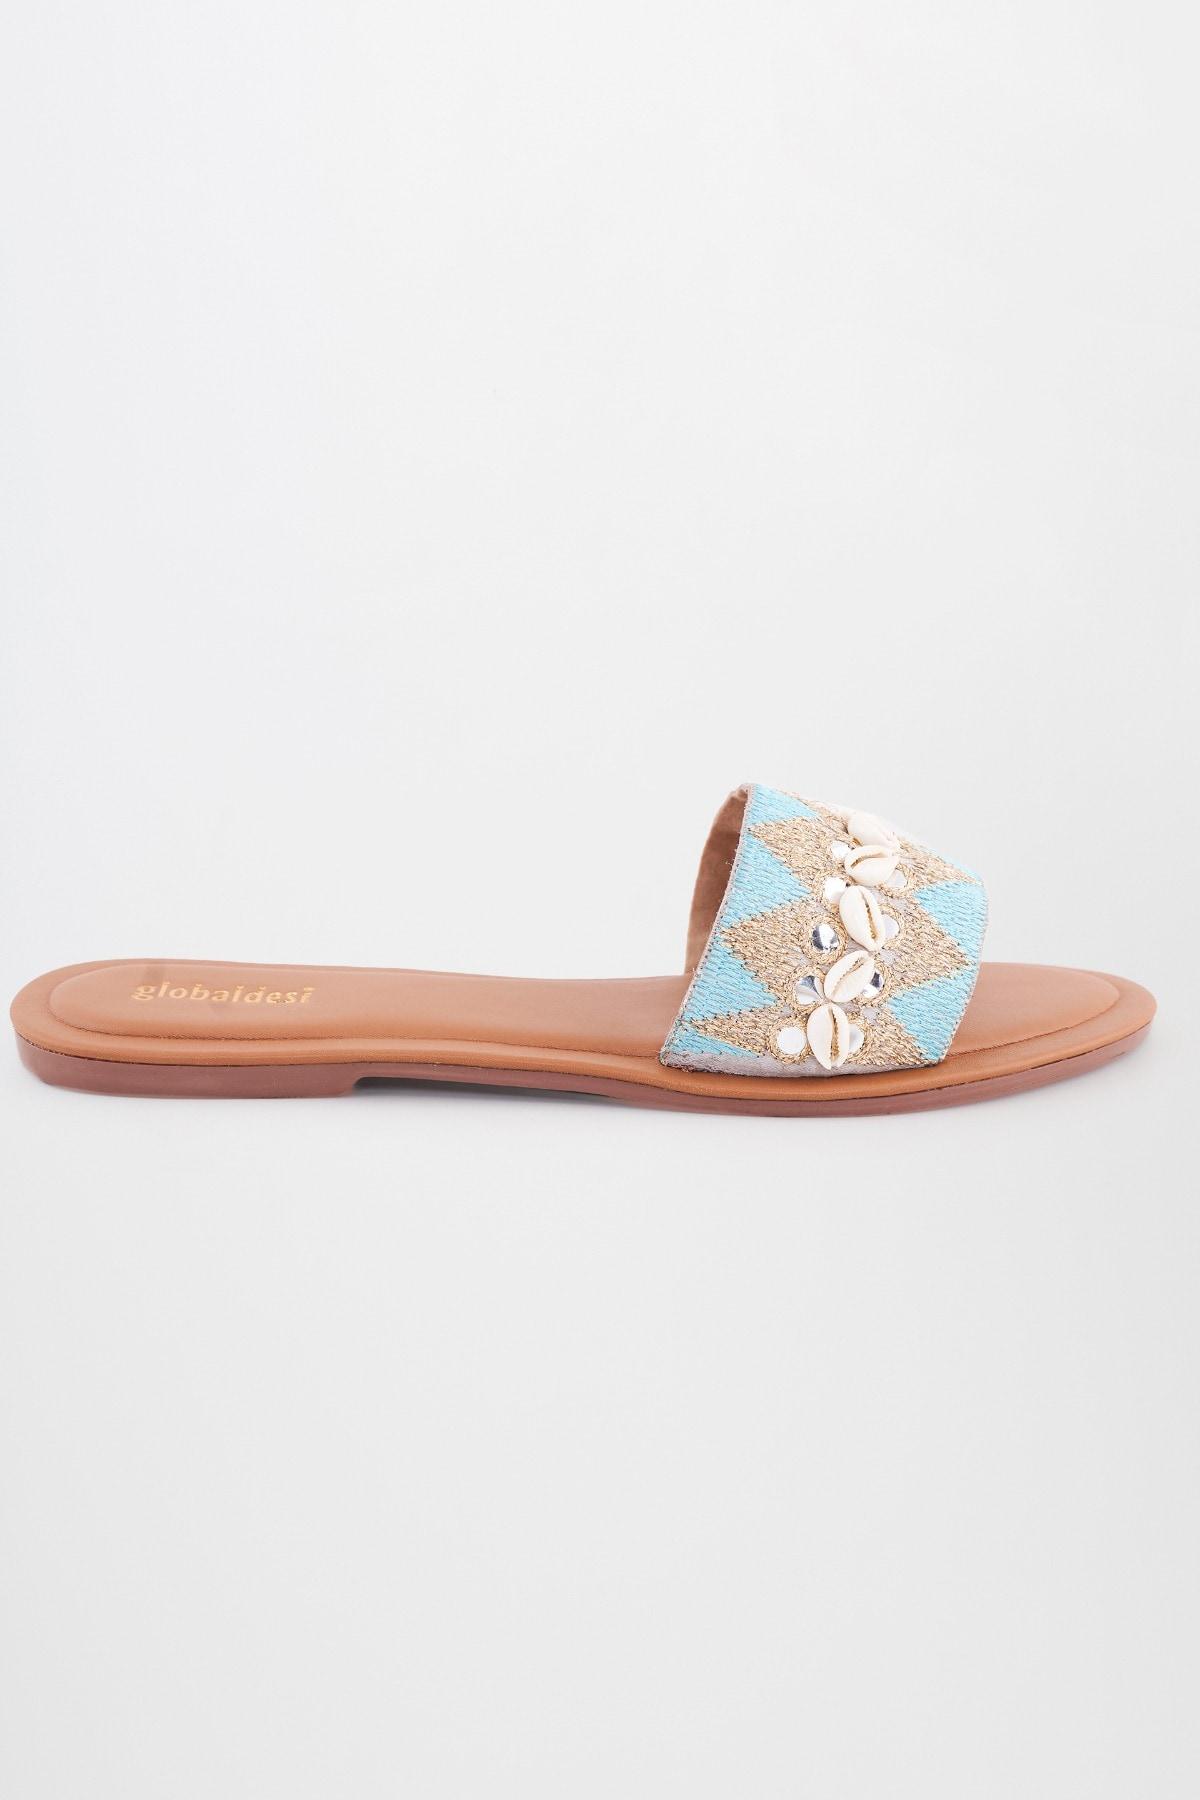 Global Desi | Blue Embroidered Flats